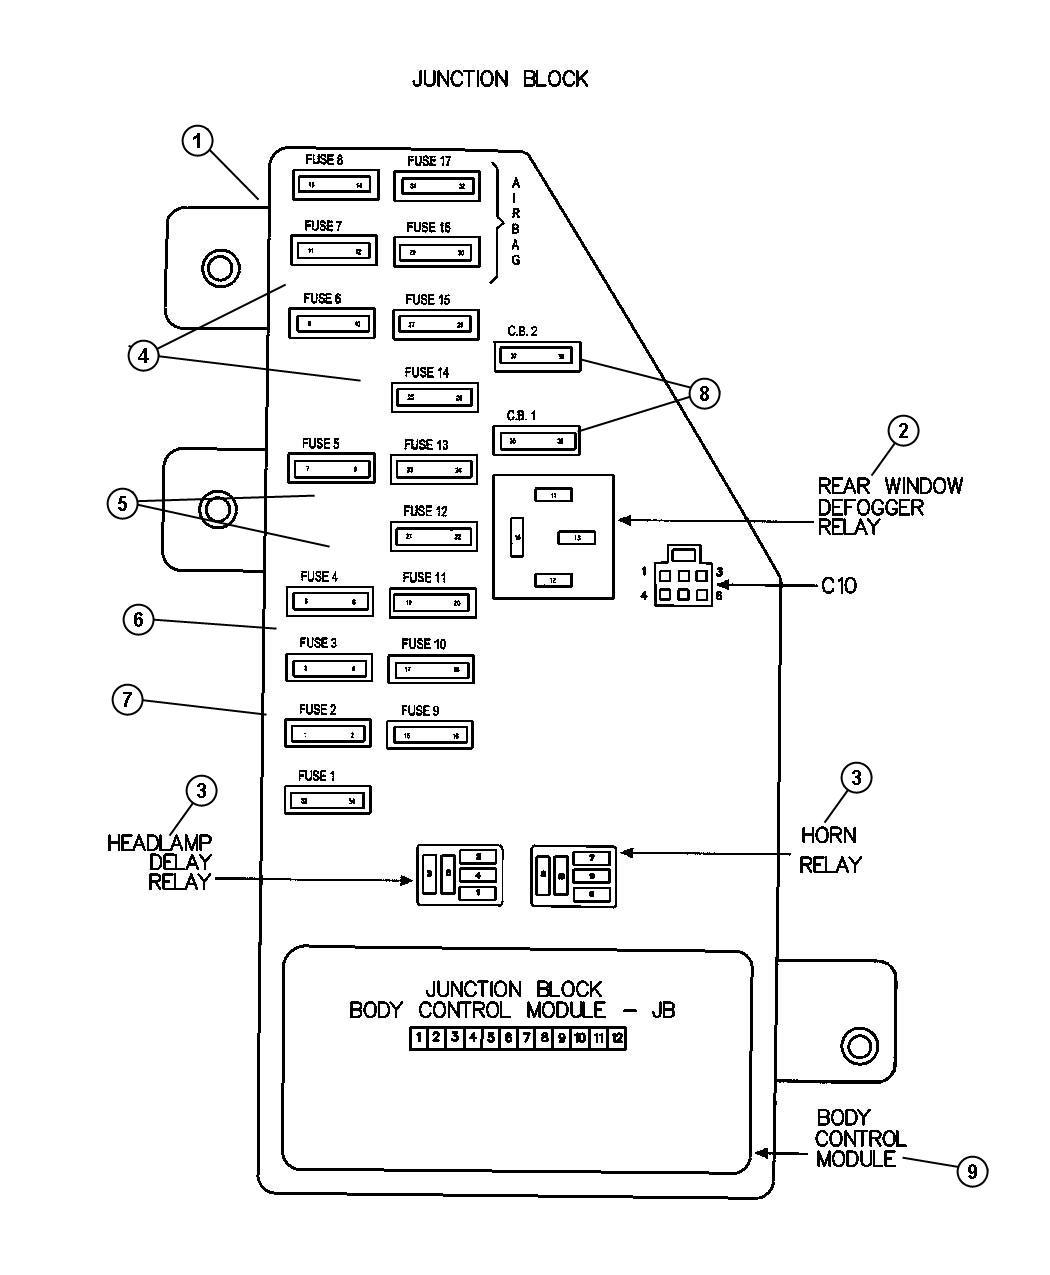 hight resolution of 2004 durango fuse diagram junction block